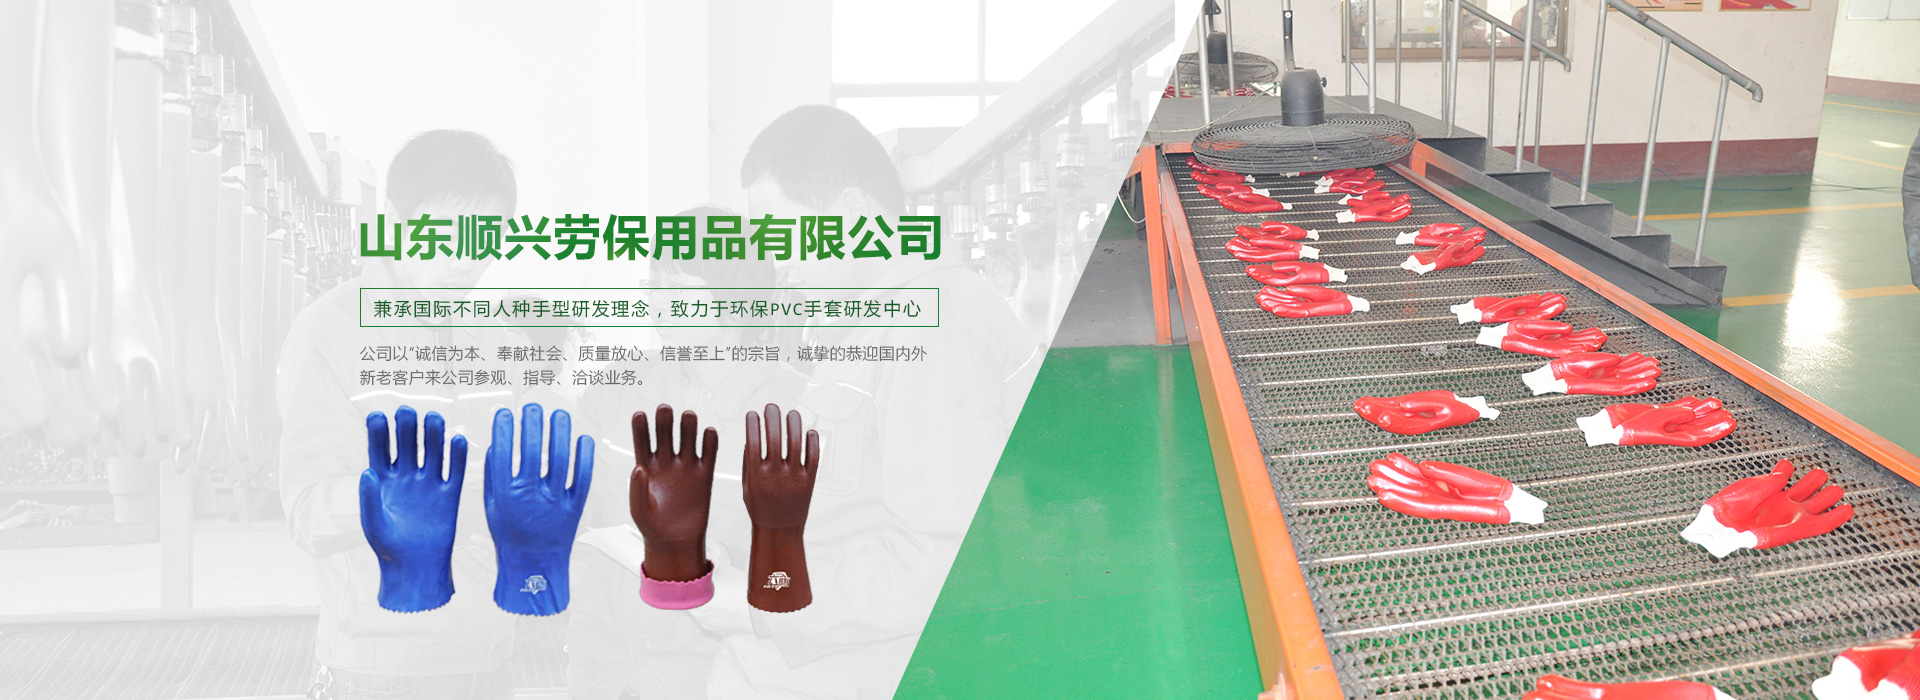 PVC劳保手套